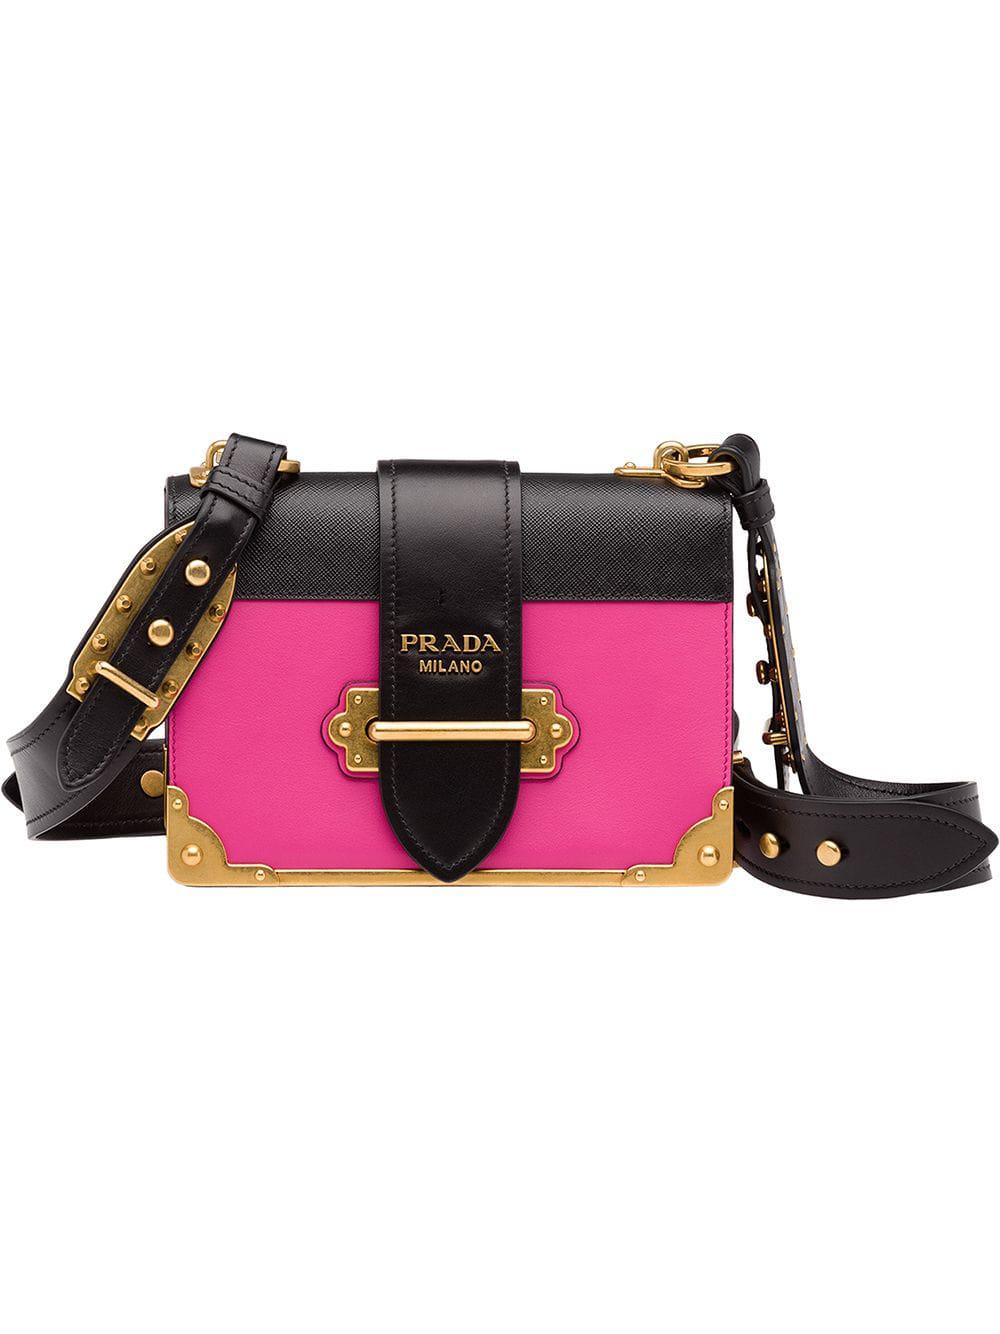 29348f8fcefd Prada Cahier Box Patent-Leather Shoulder Bag In Black | ModeSens